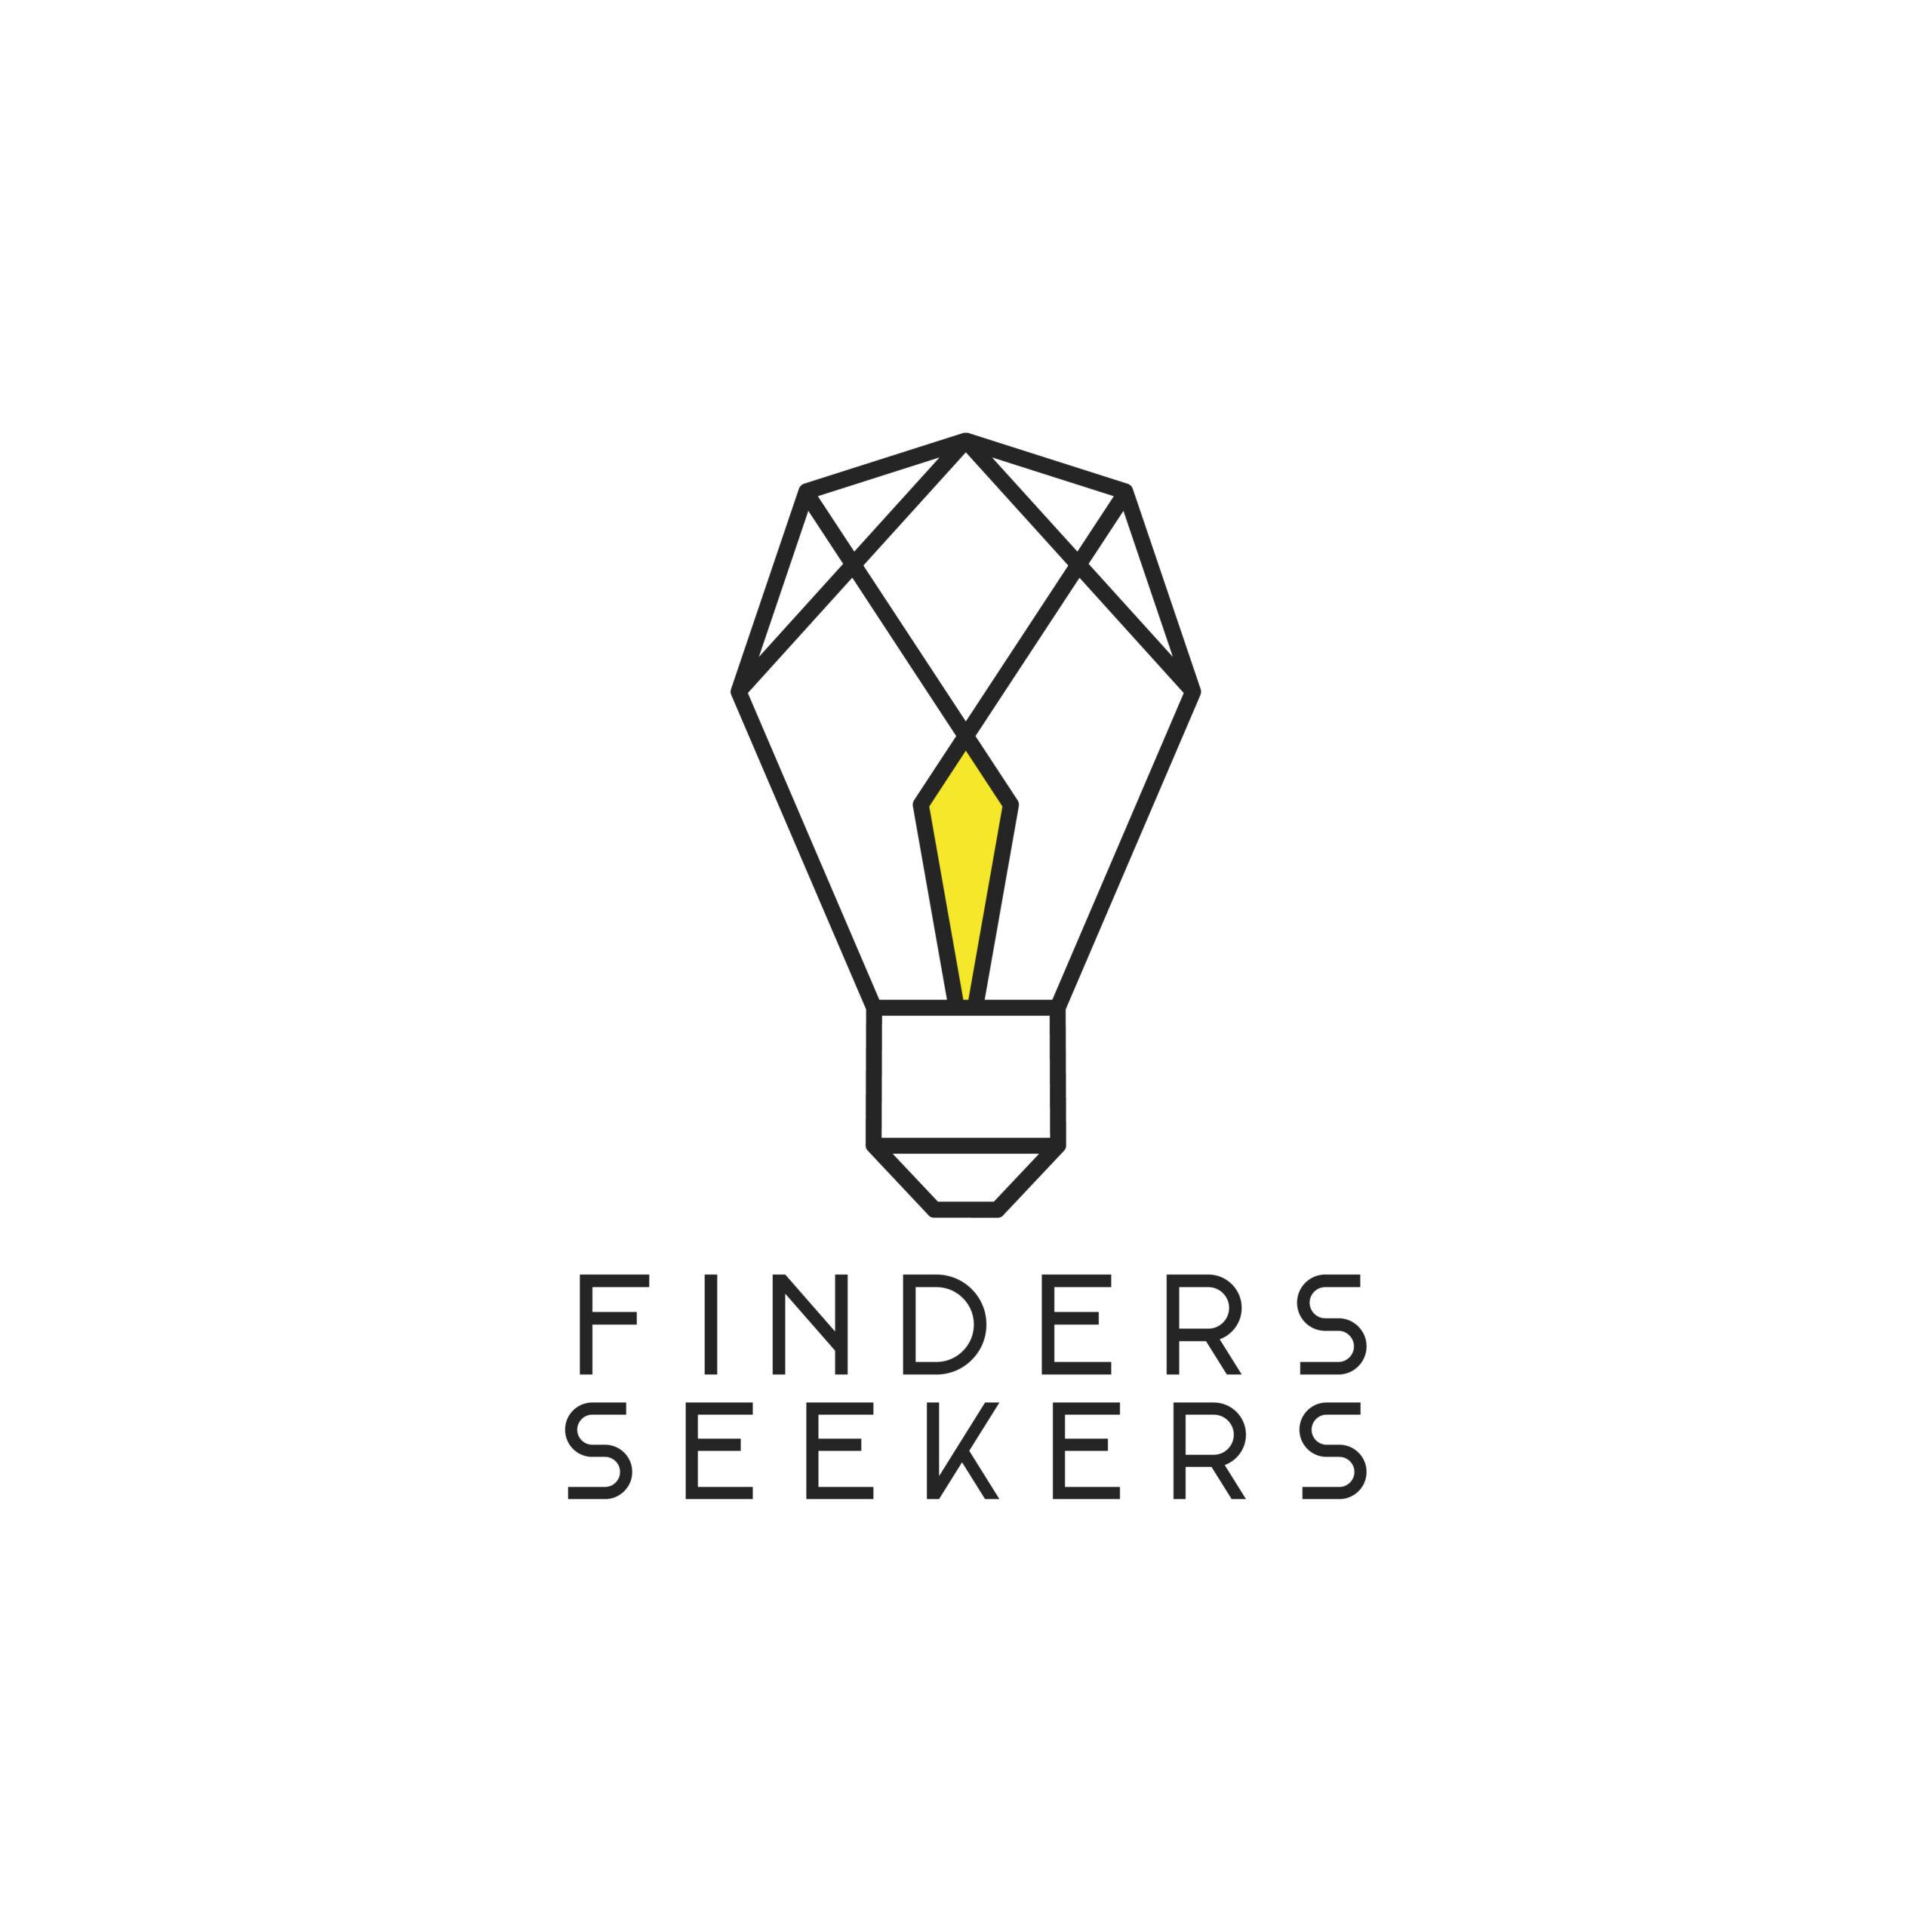 Link to external partner website findersseekers.io